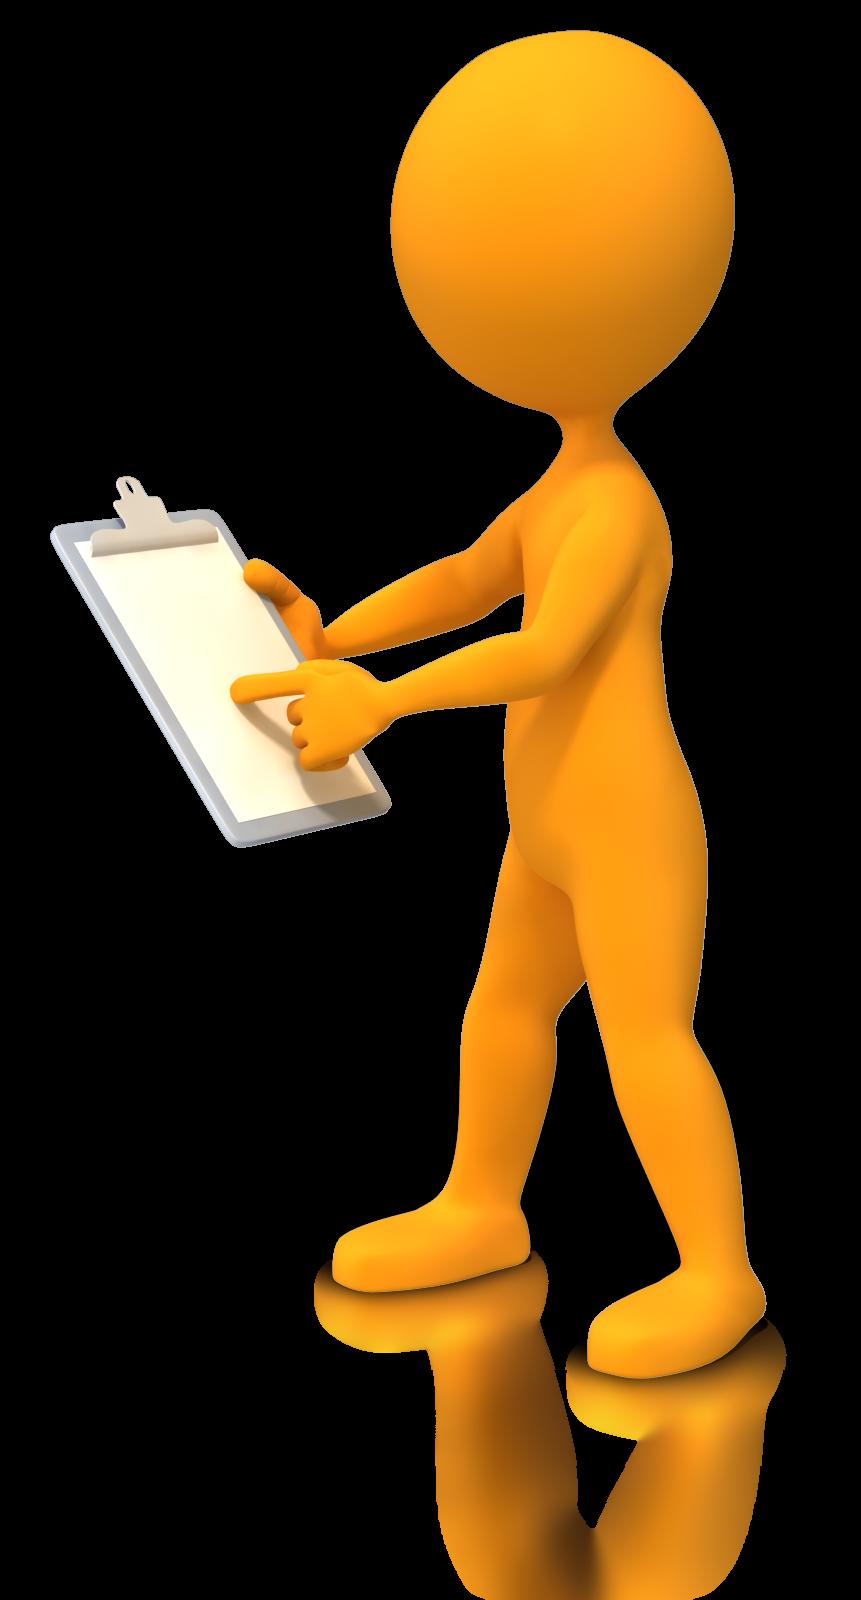 Animation clipboard stick figure. Evaluation clipart evaluation sheet